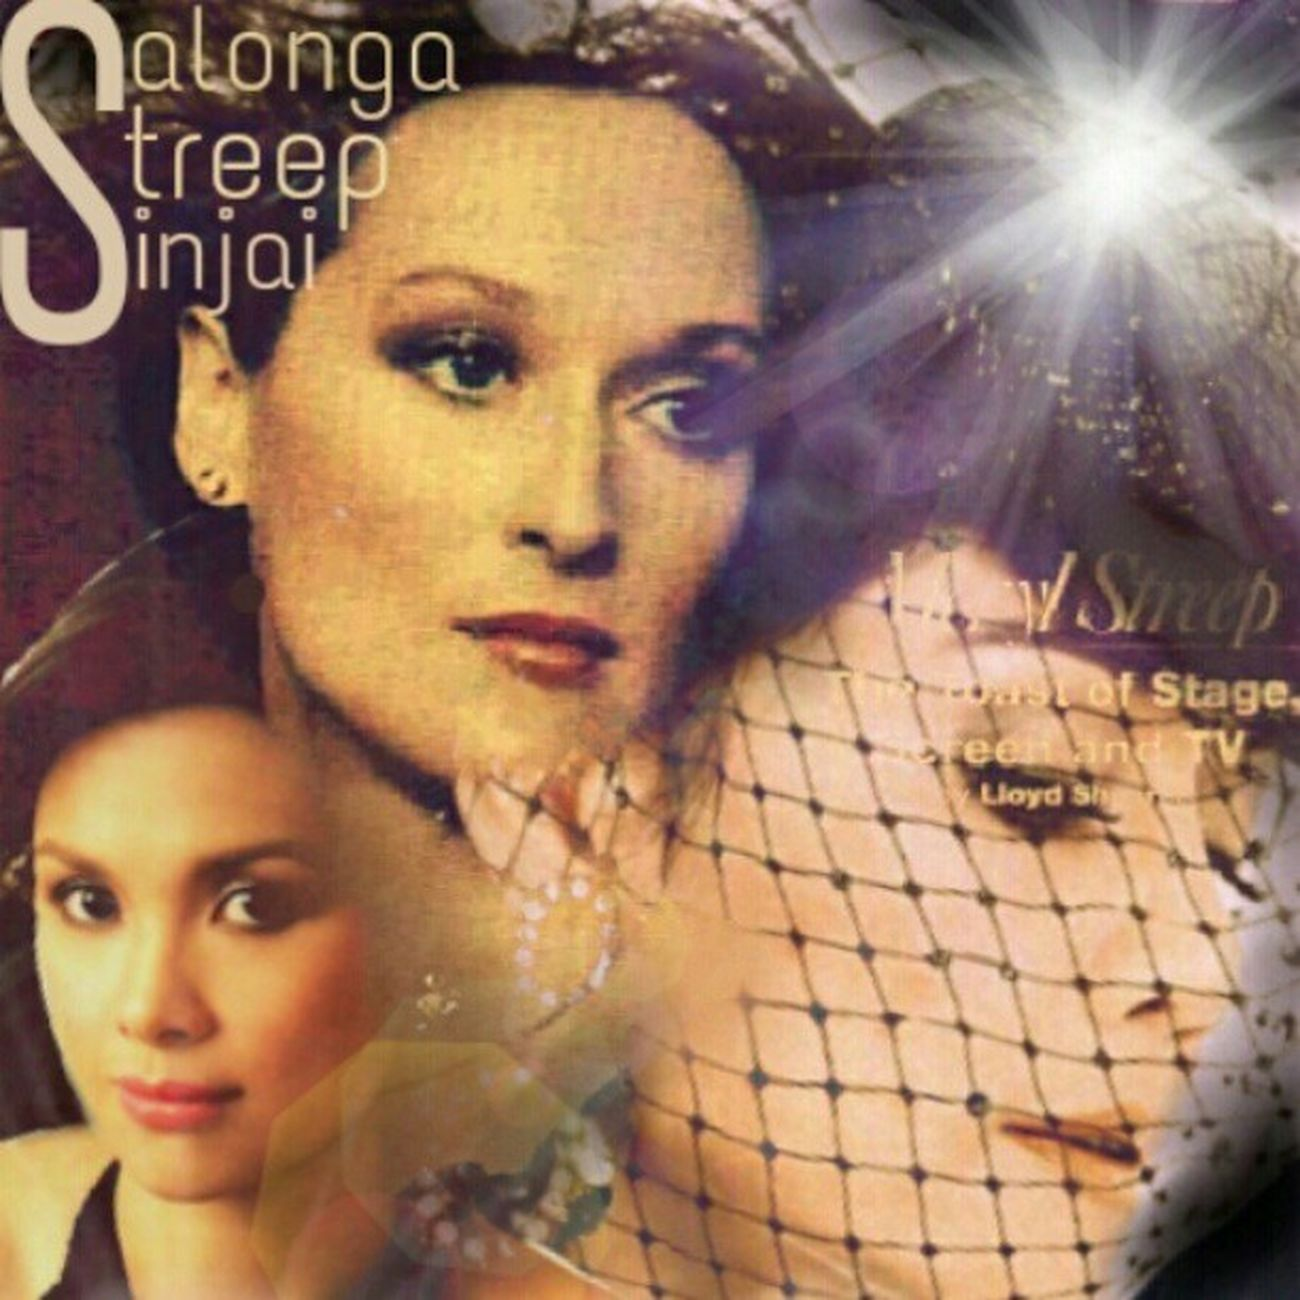 Freak out with these ladies : the original Merylstreep & Leasalonga plus Extra Noksinjai